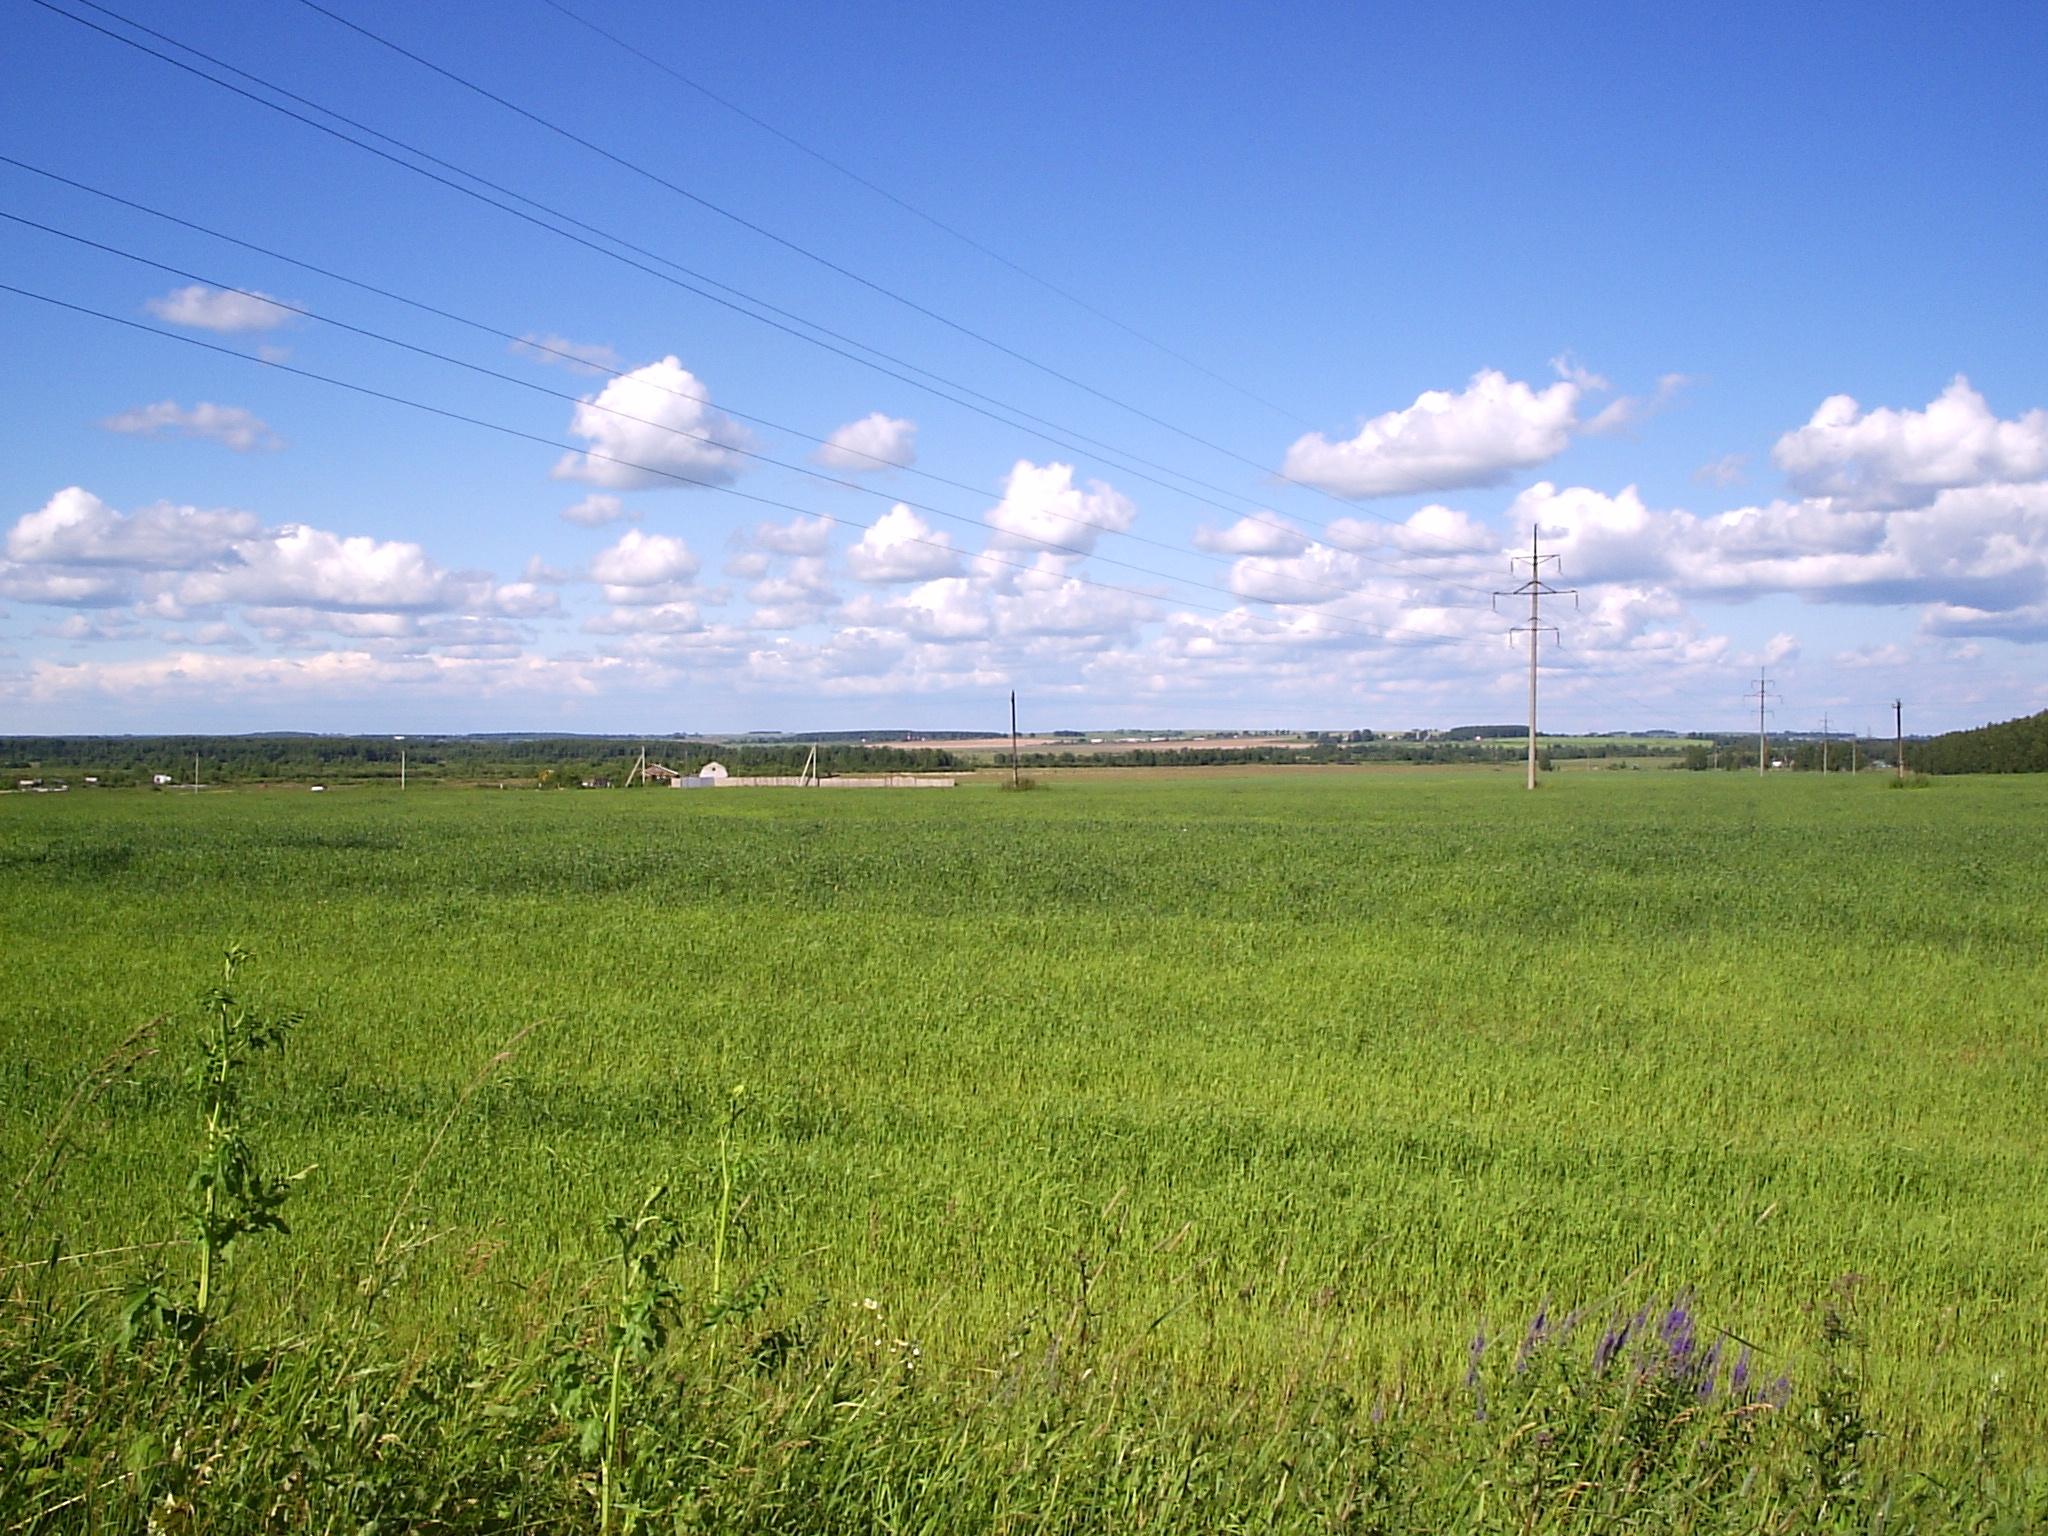 Landscape View – Free wallpaper download